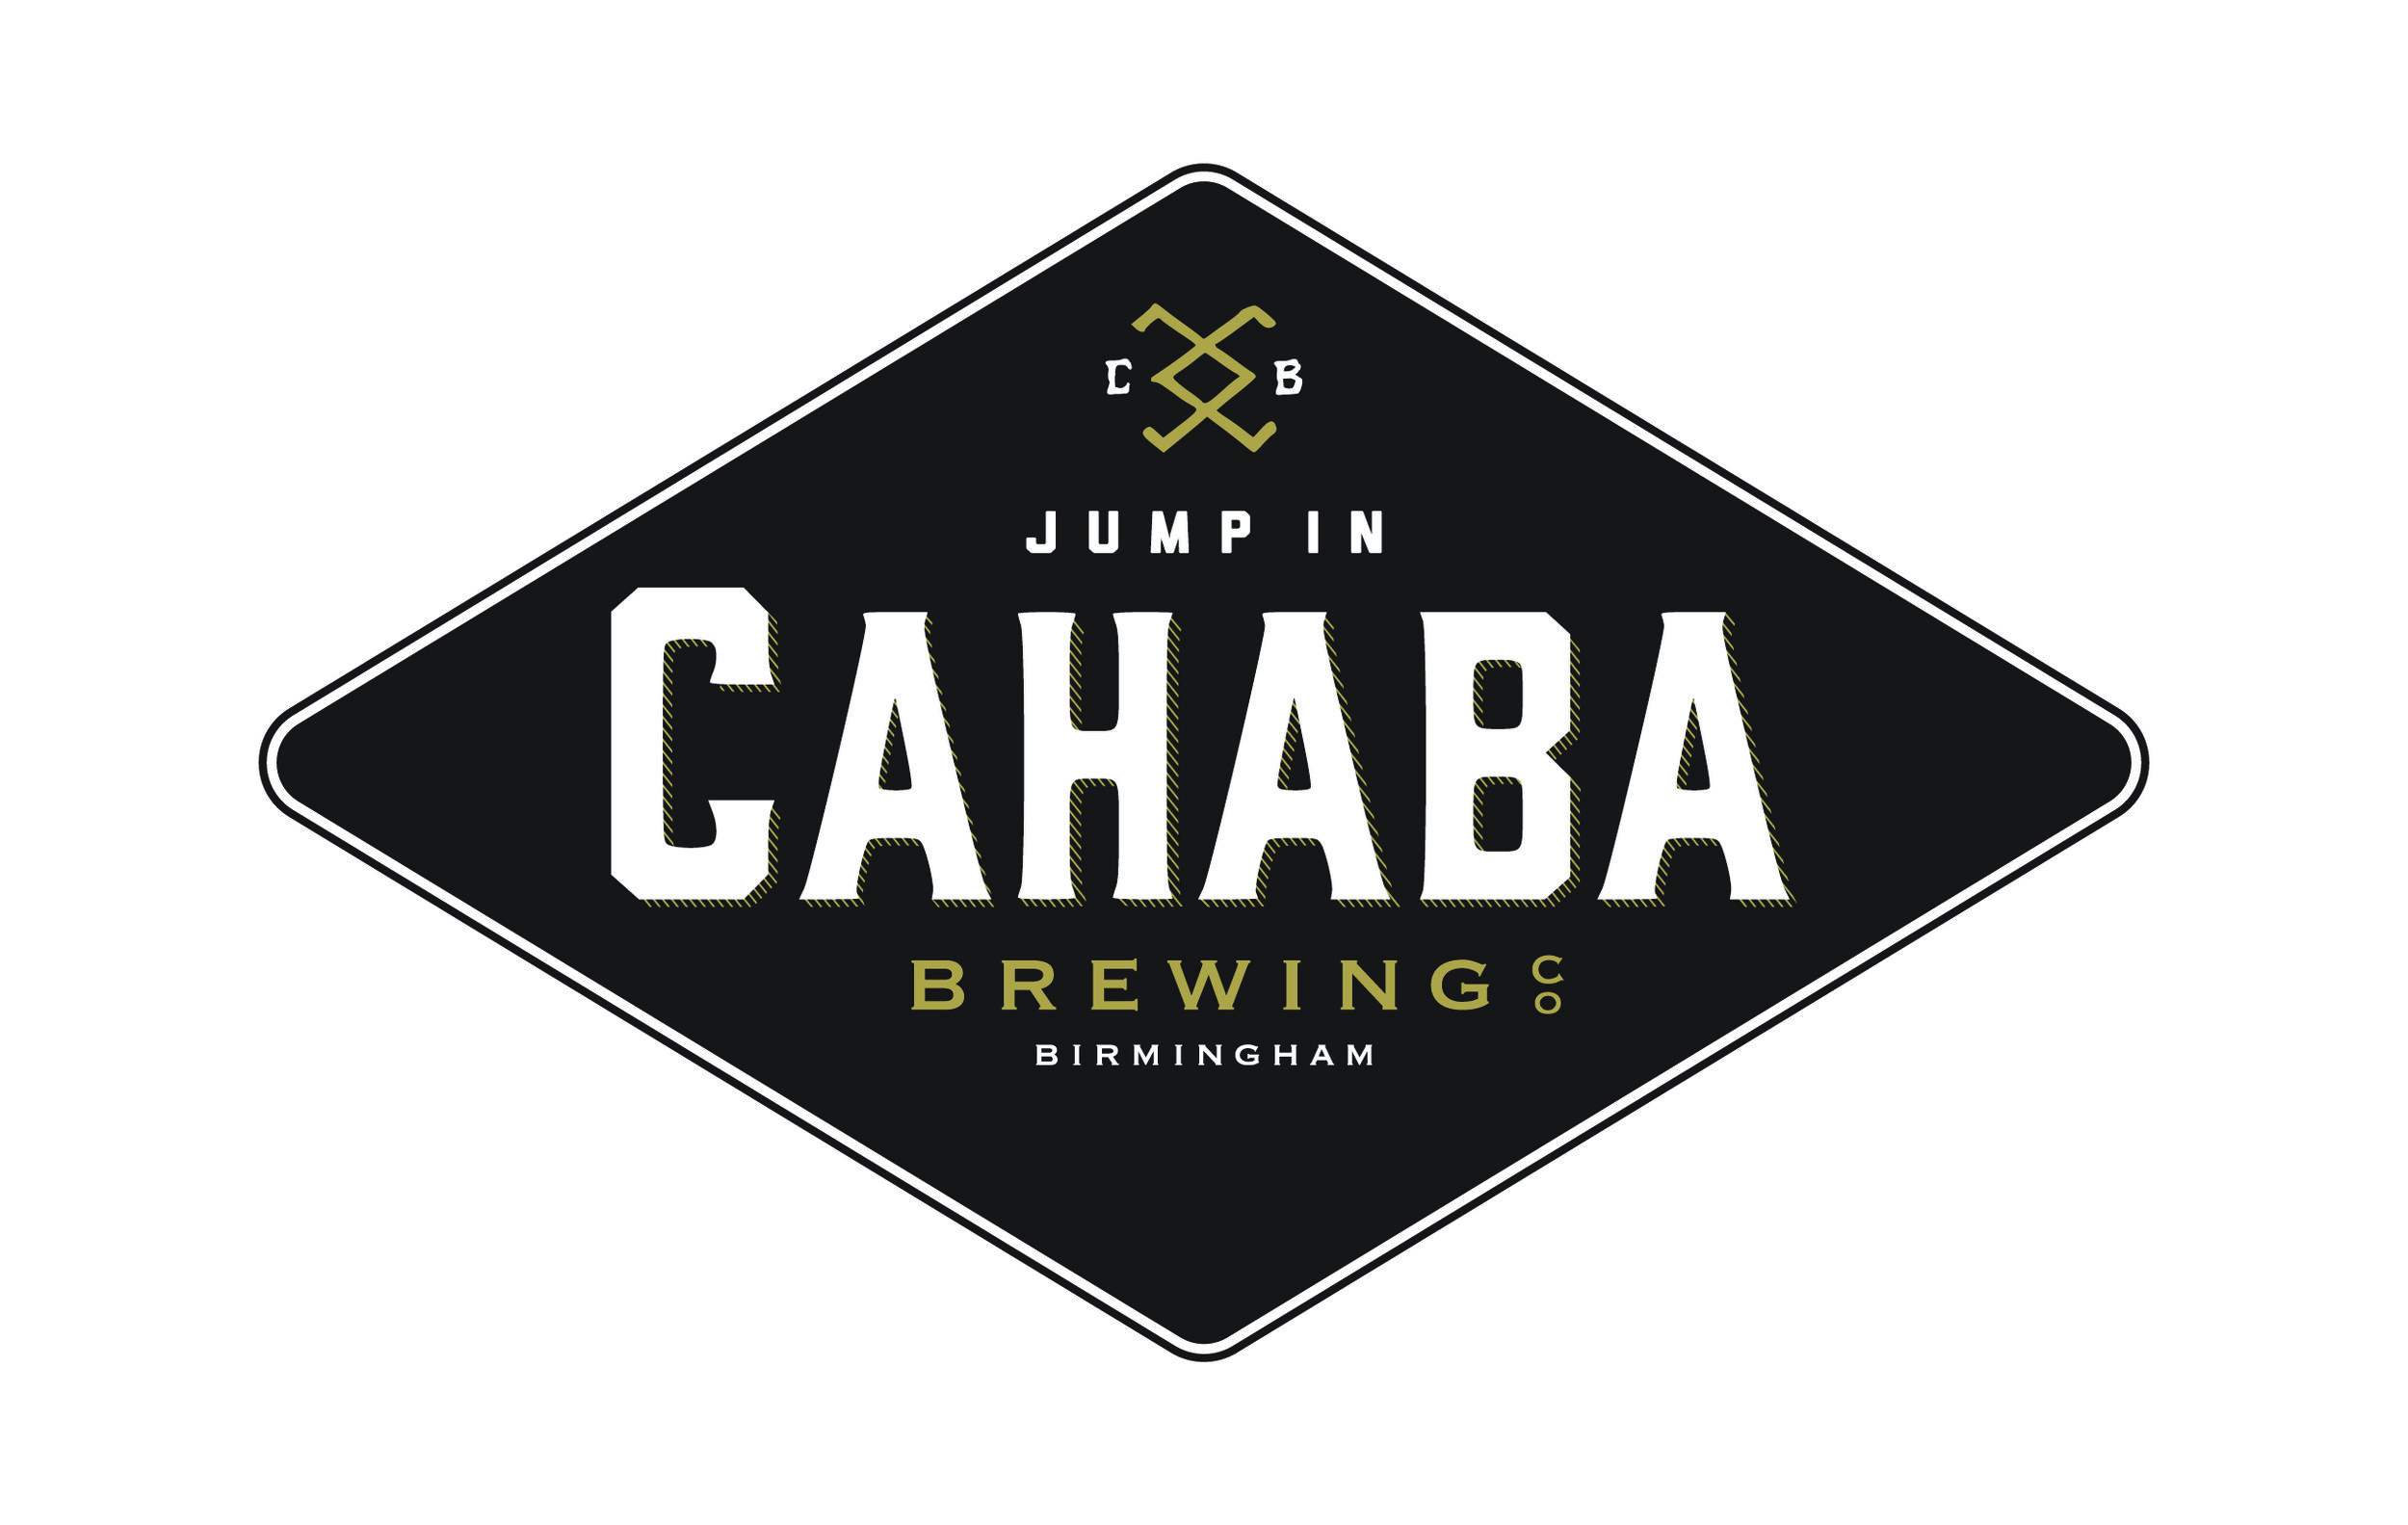 Cahaba logos FINAL-01 copy.jpg